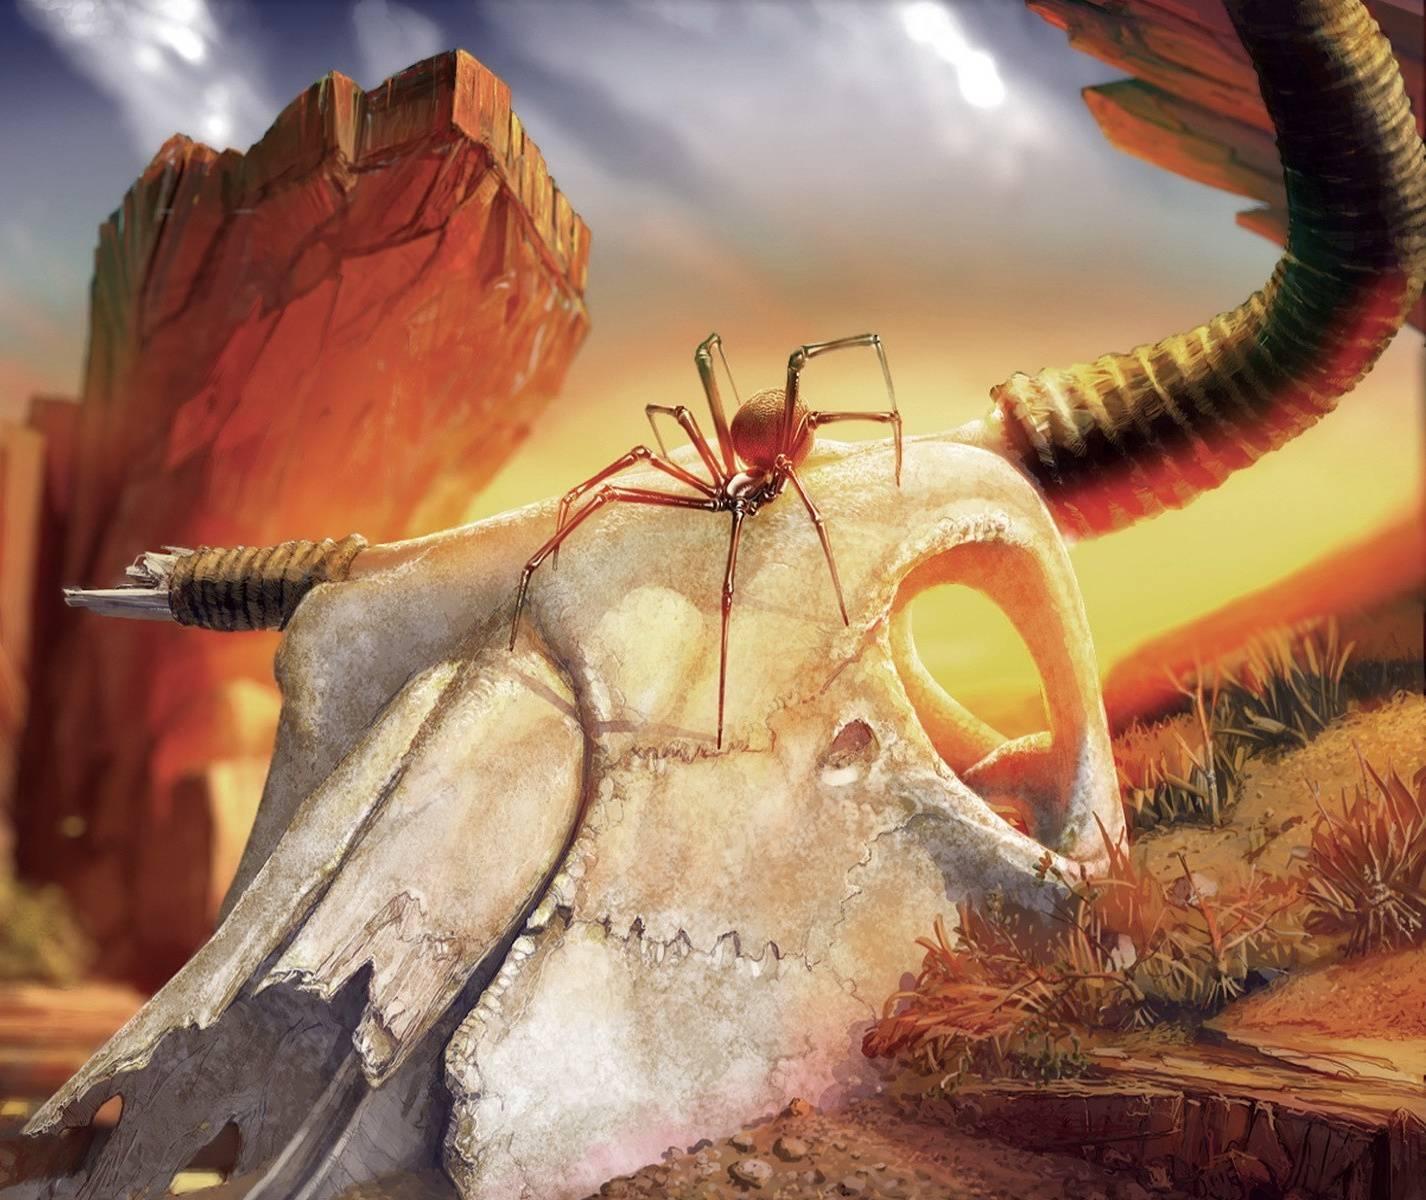 Spider In The Desert